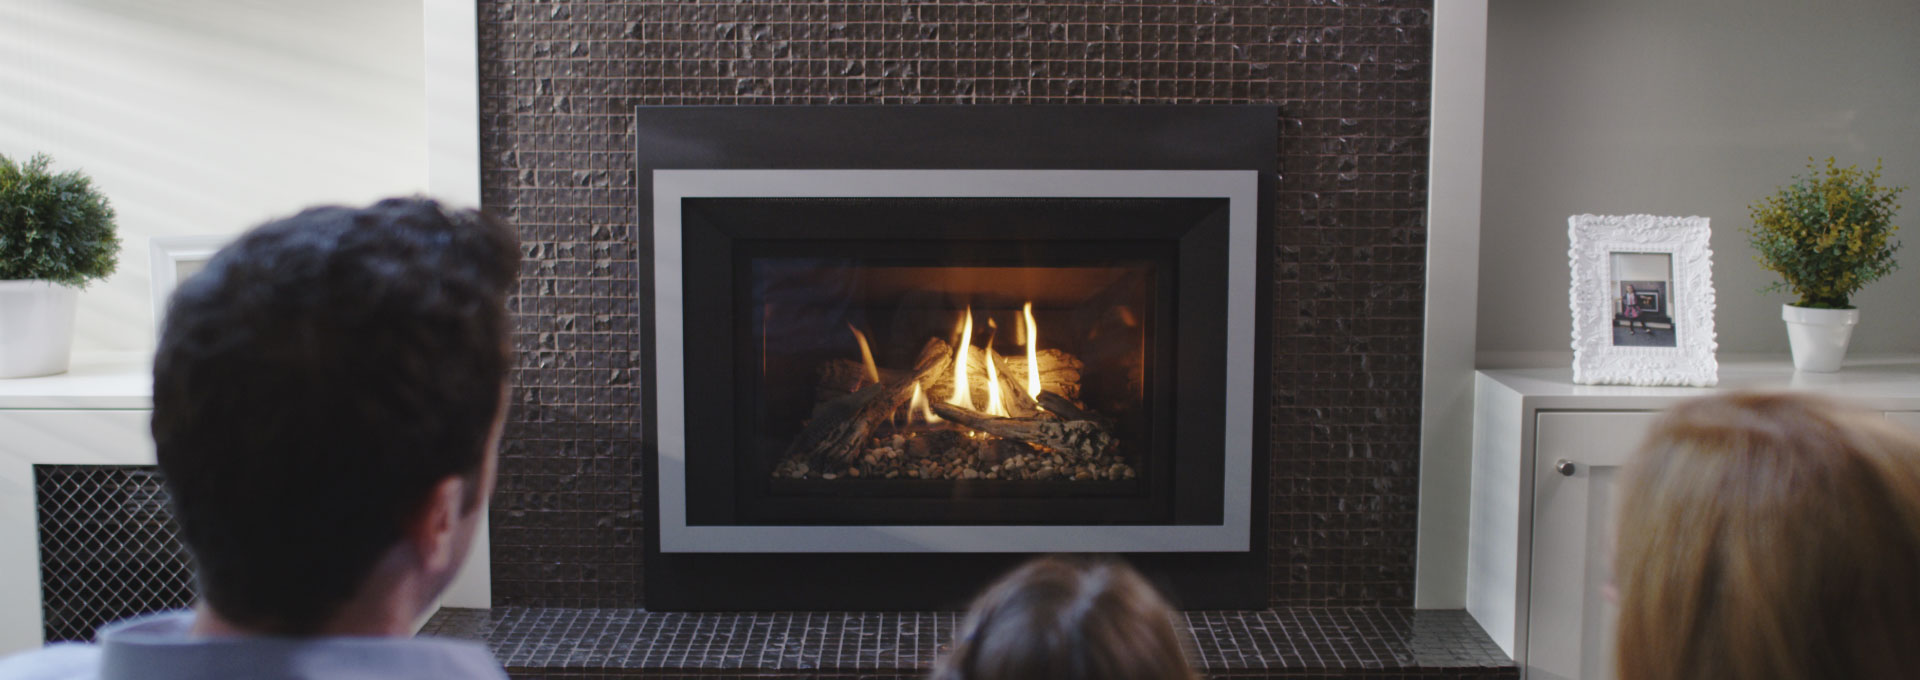 gas fireplace inserts regency fireplace products rh regency fire com LP Gas Fireplace Inserts Outdoor Gas Firebox Inserts